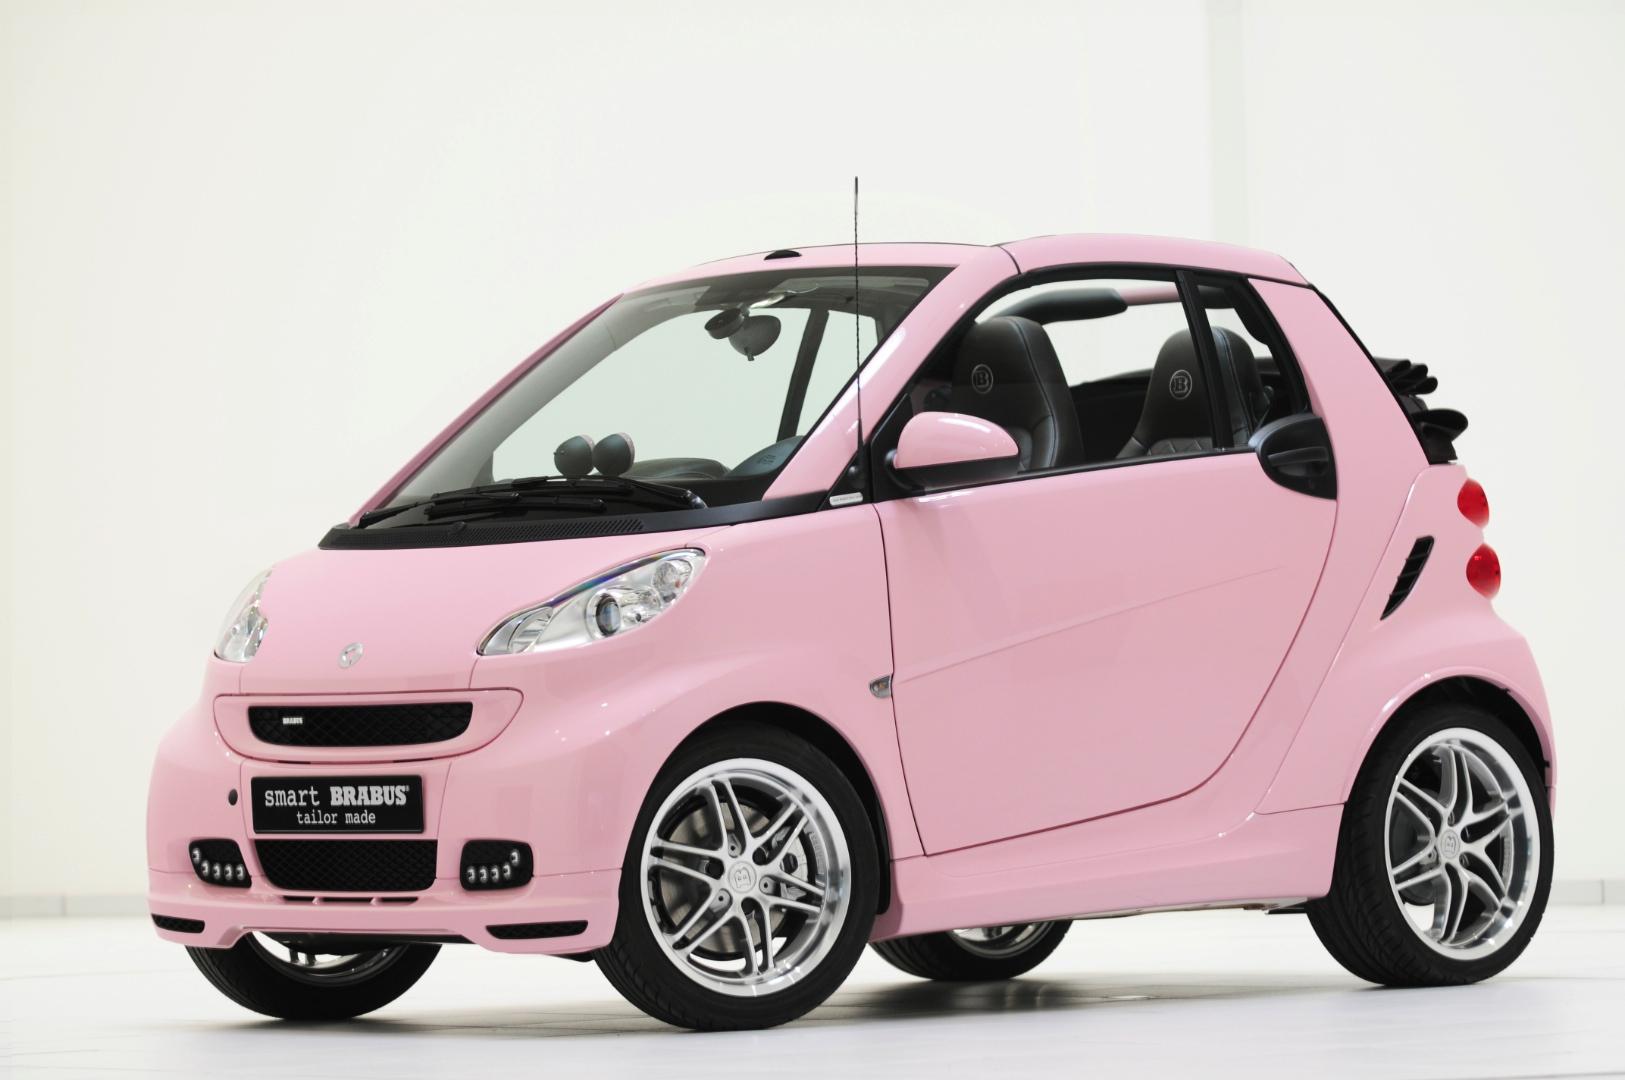 8136477smart-fortwo-wins-most-embarrassing-car-award-64594_1